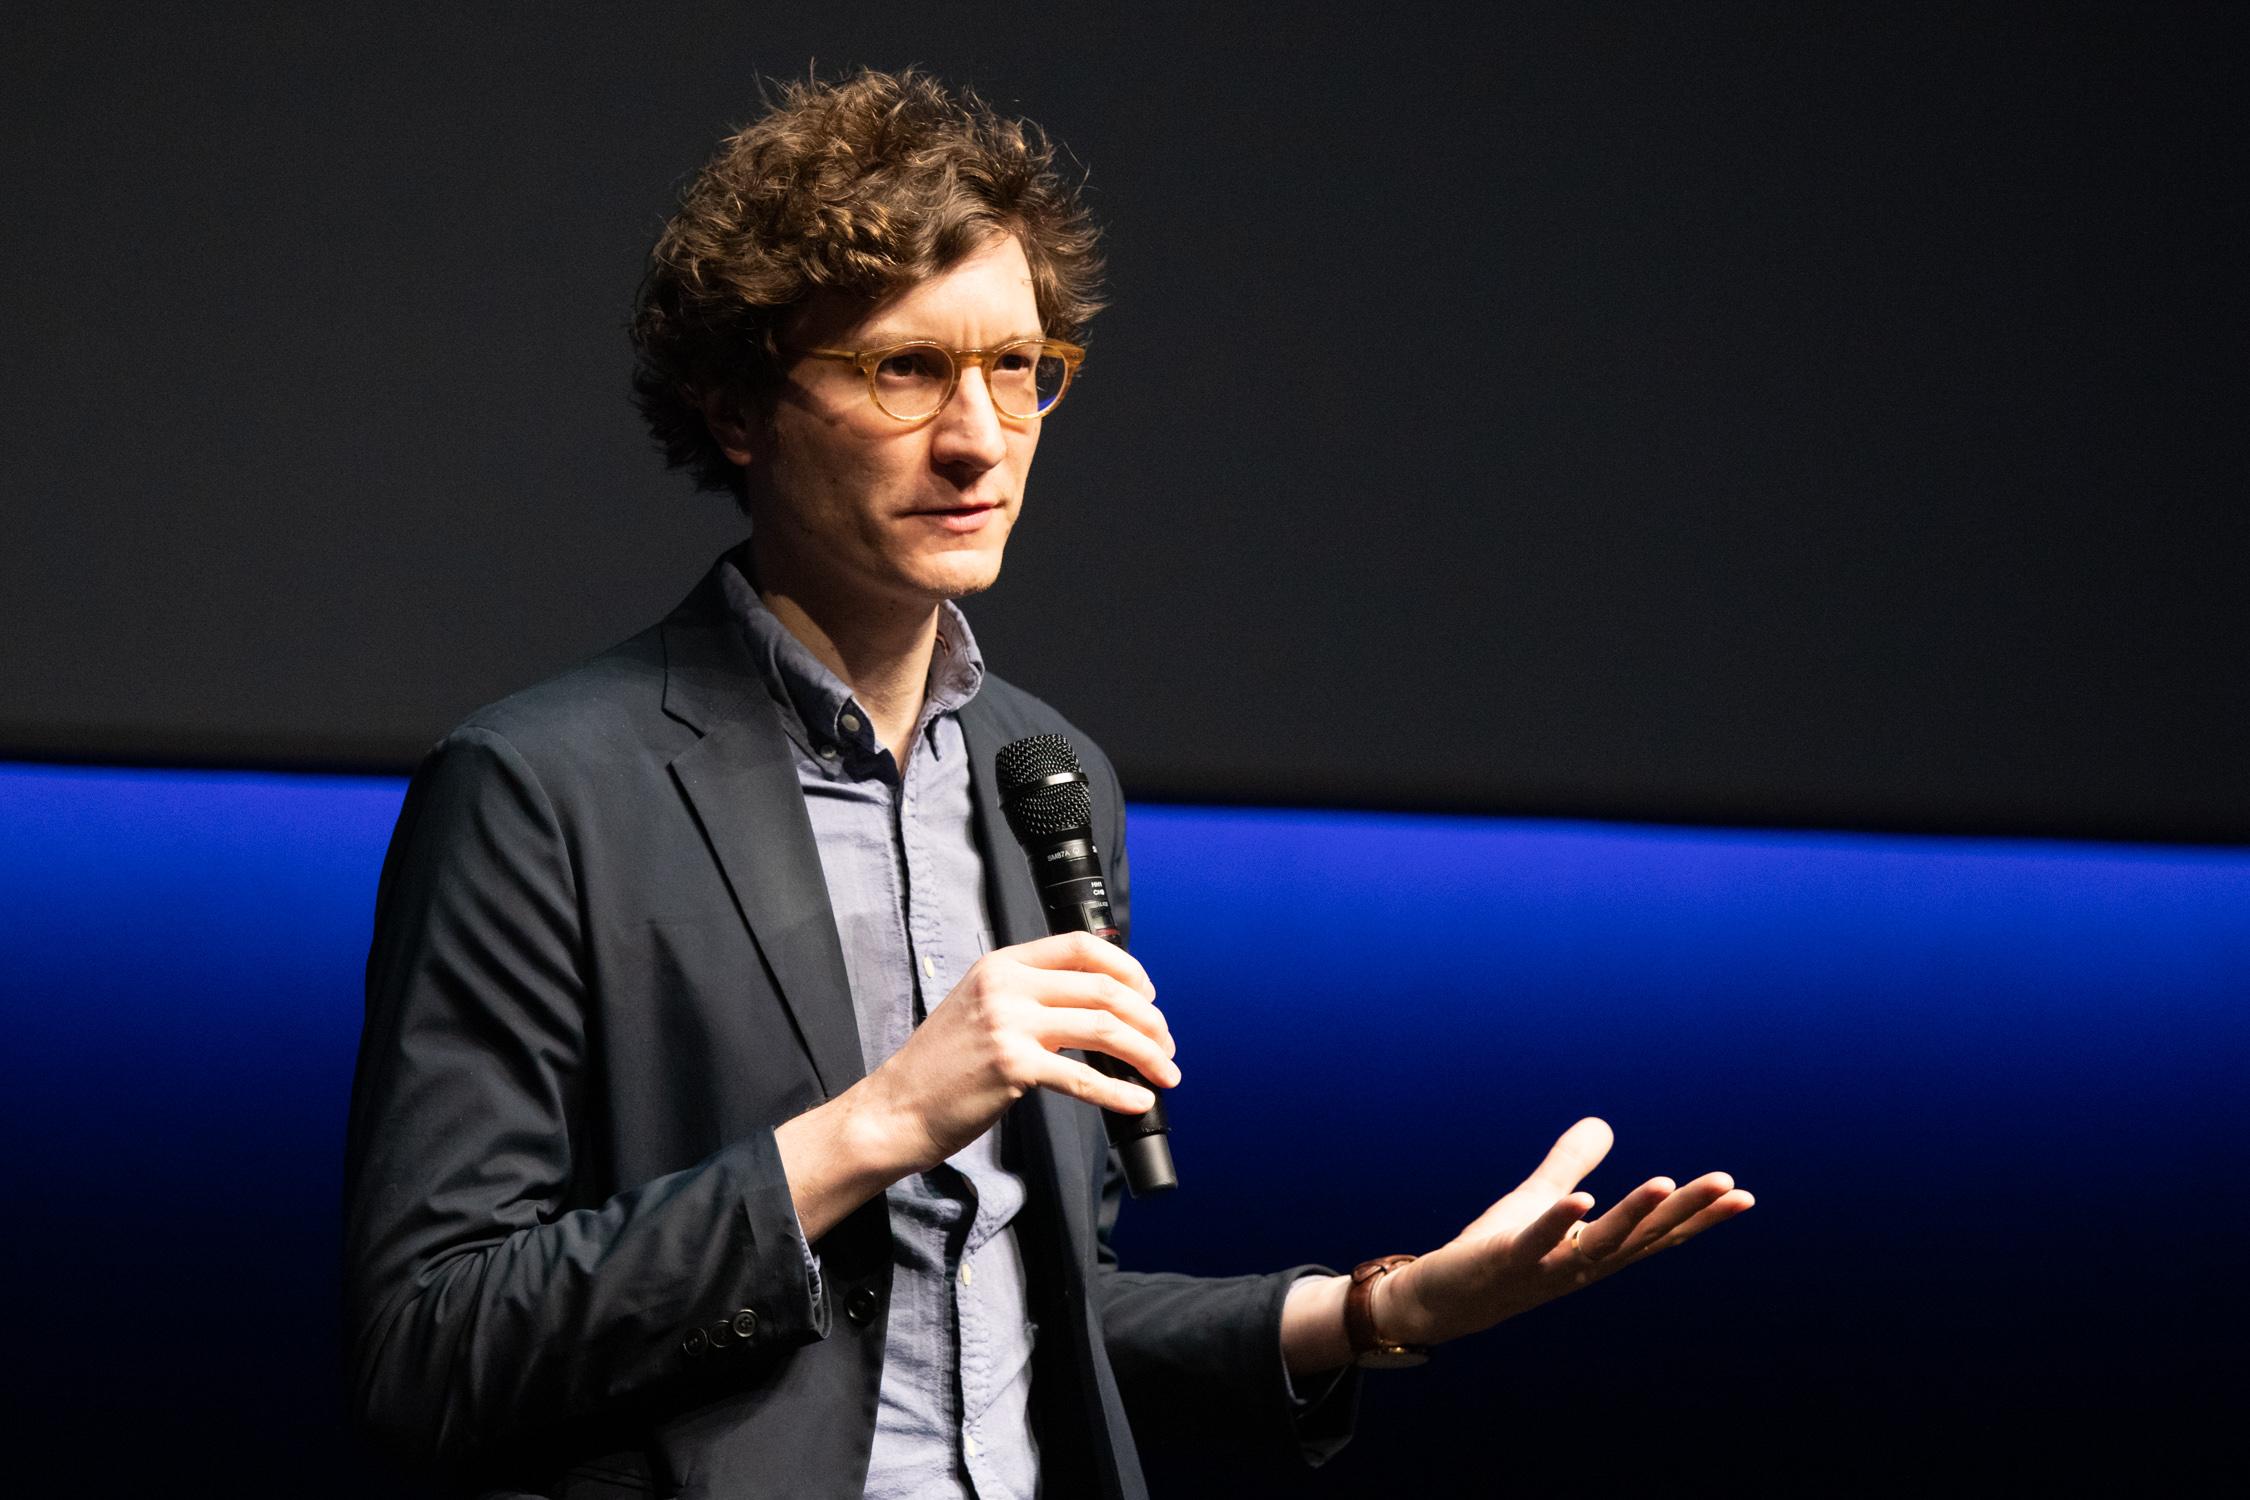 Michael Tyburski speaks at Dolby Cinema at San Francisco Film Festival